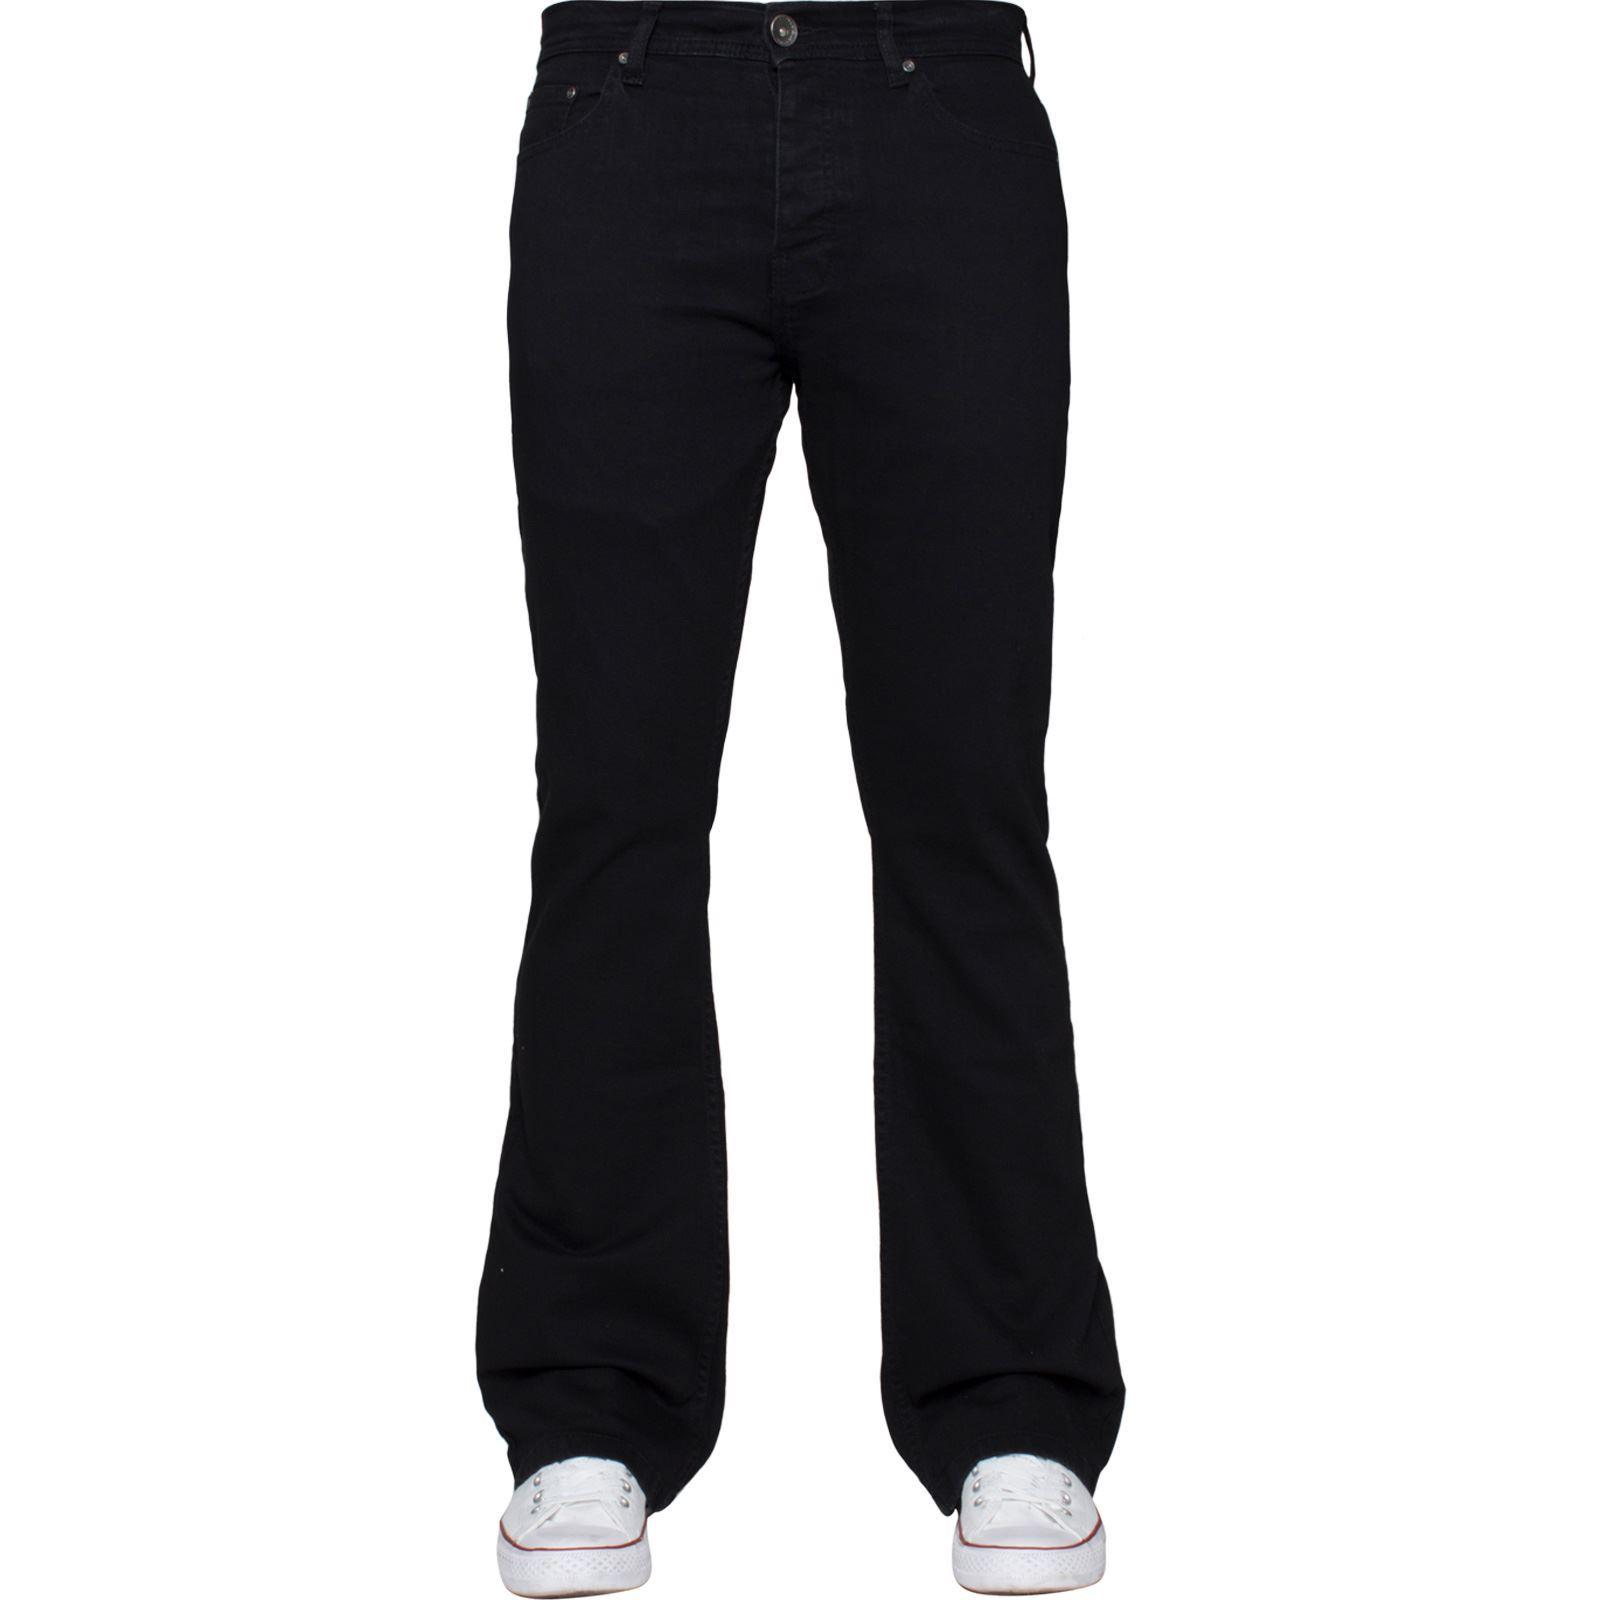 Para-Hombre-Pierna-Recta-Bootcut-Stretch-Denim-Regulares-Pantalon-de-trabajo-Kruze-Todas-Cinturas miniatura 67